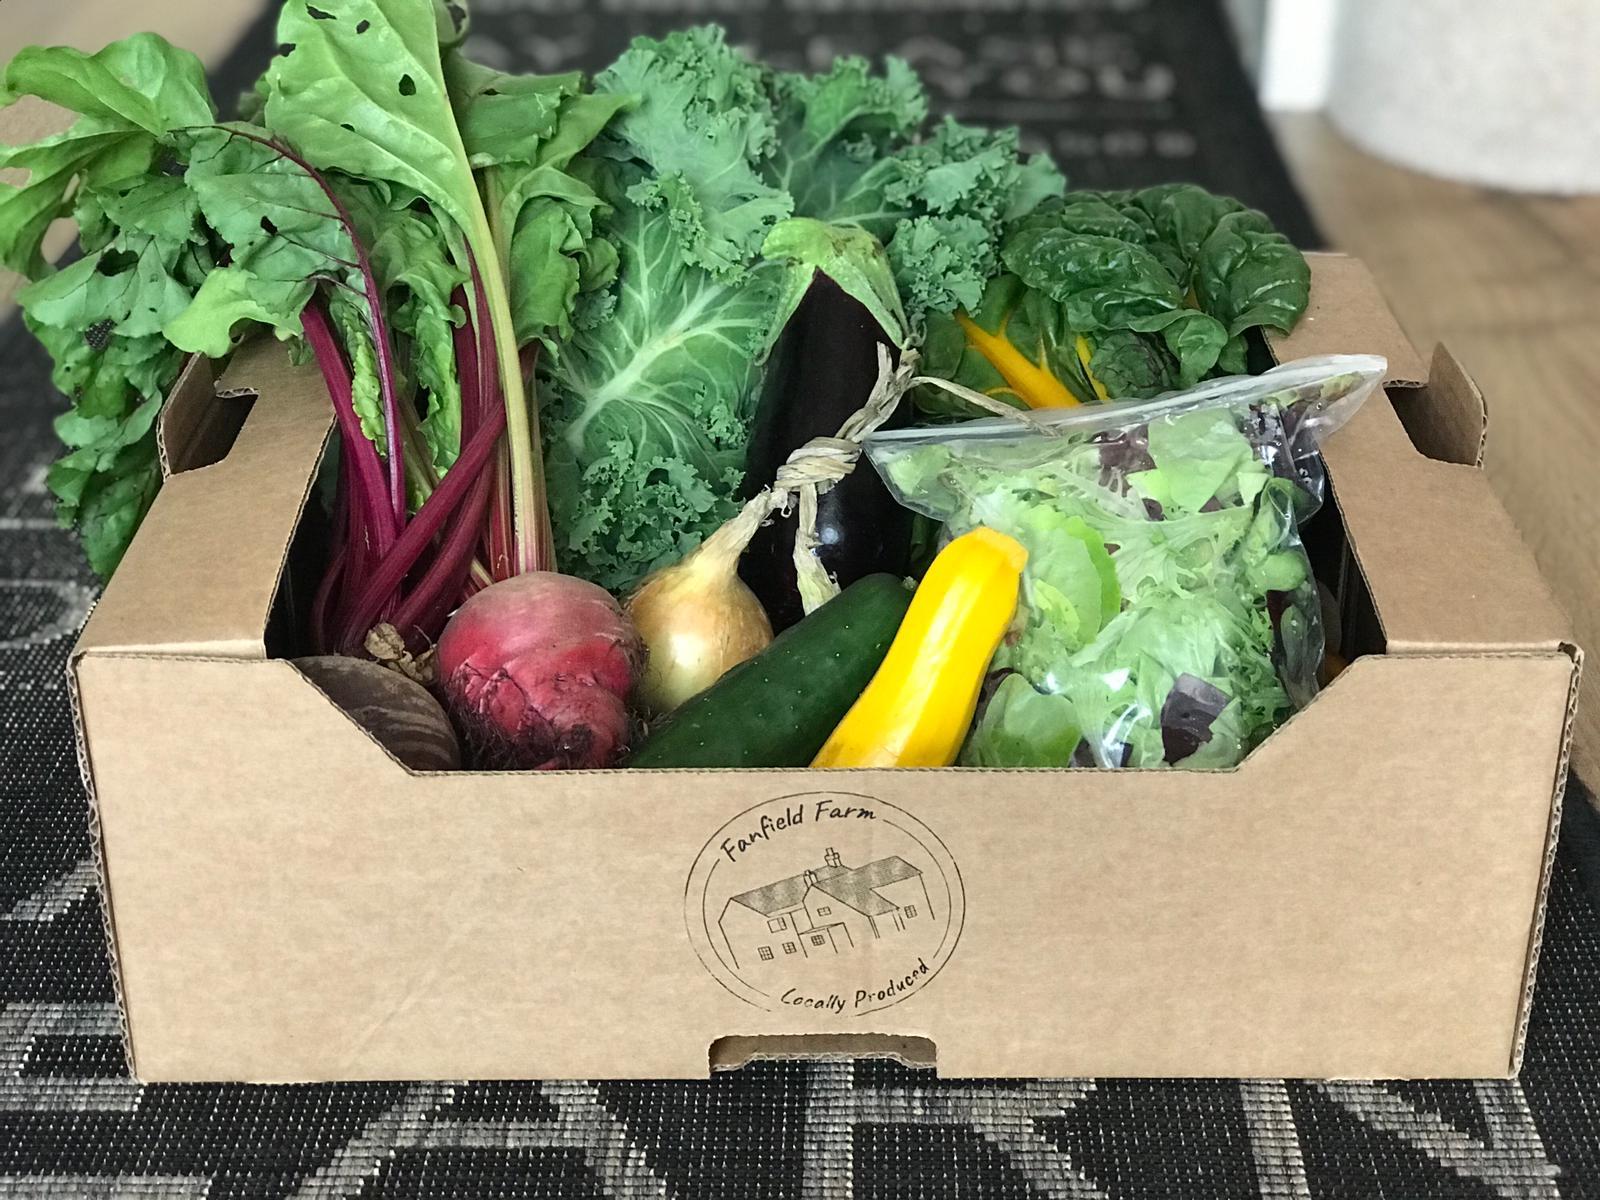 Fanfield Farm Veg Box 3